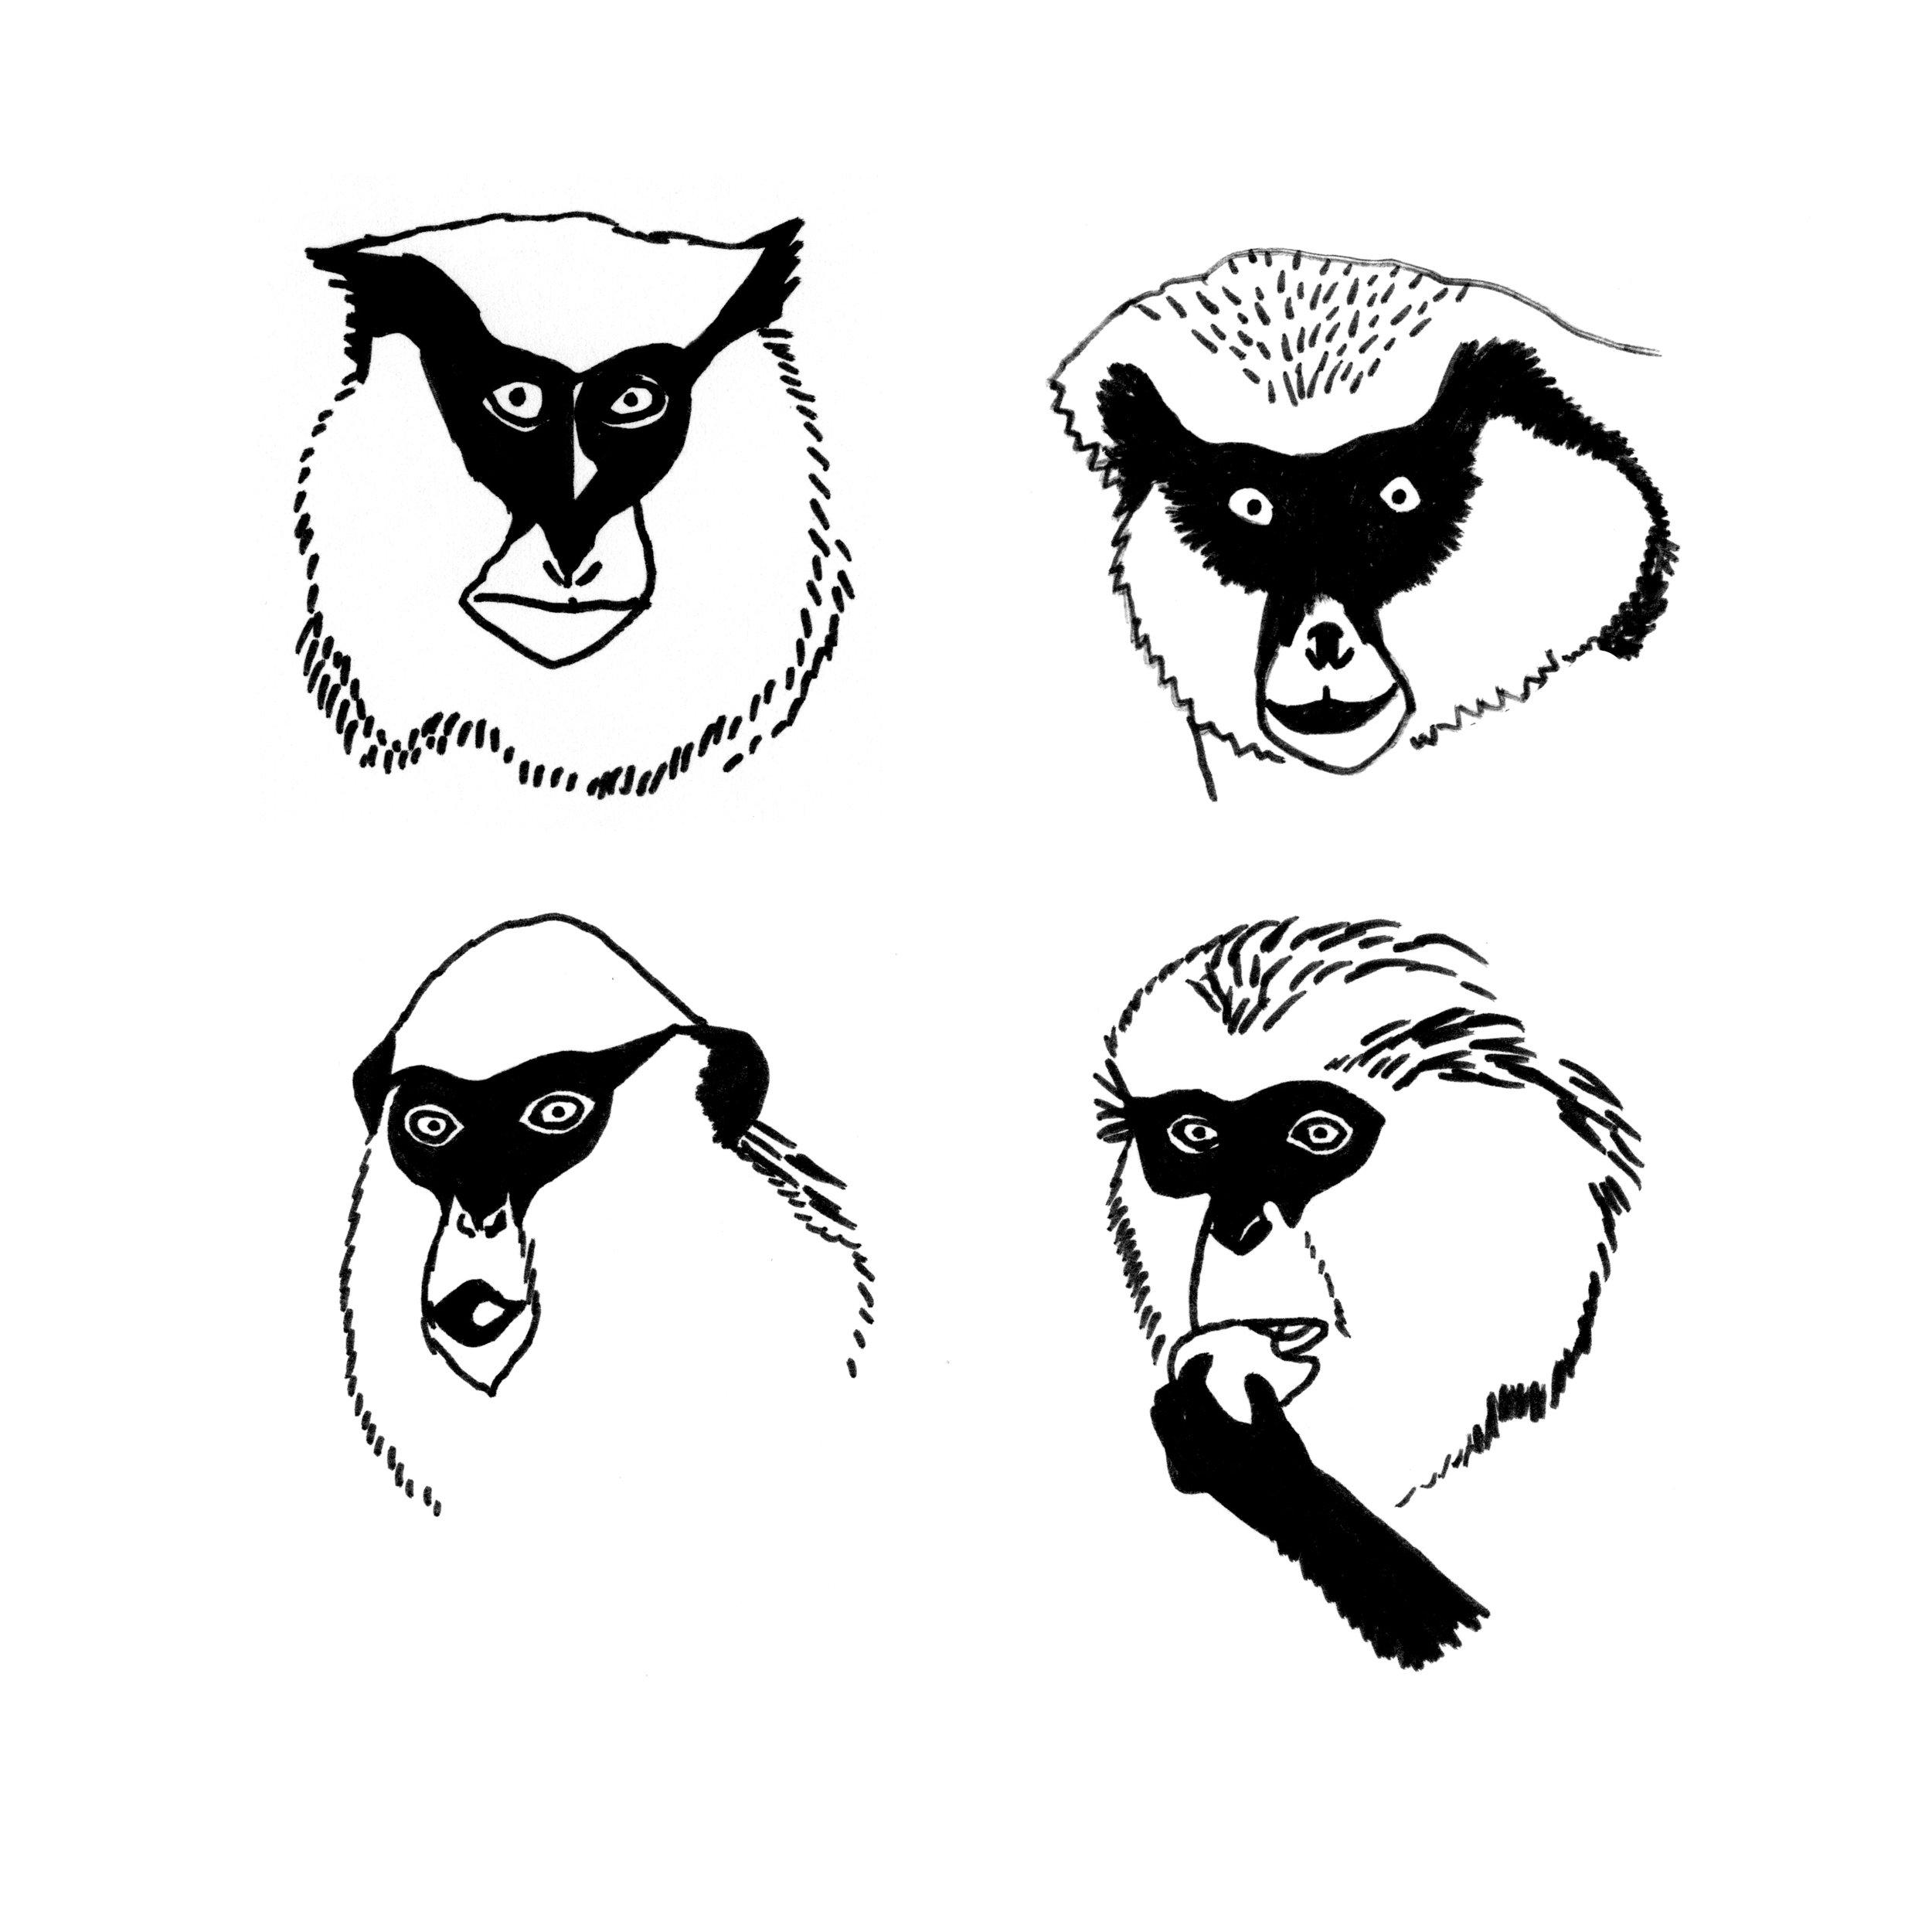 monkey_acp.jpg